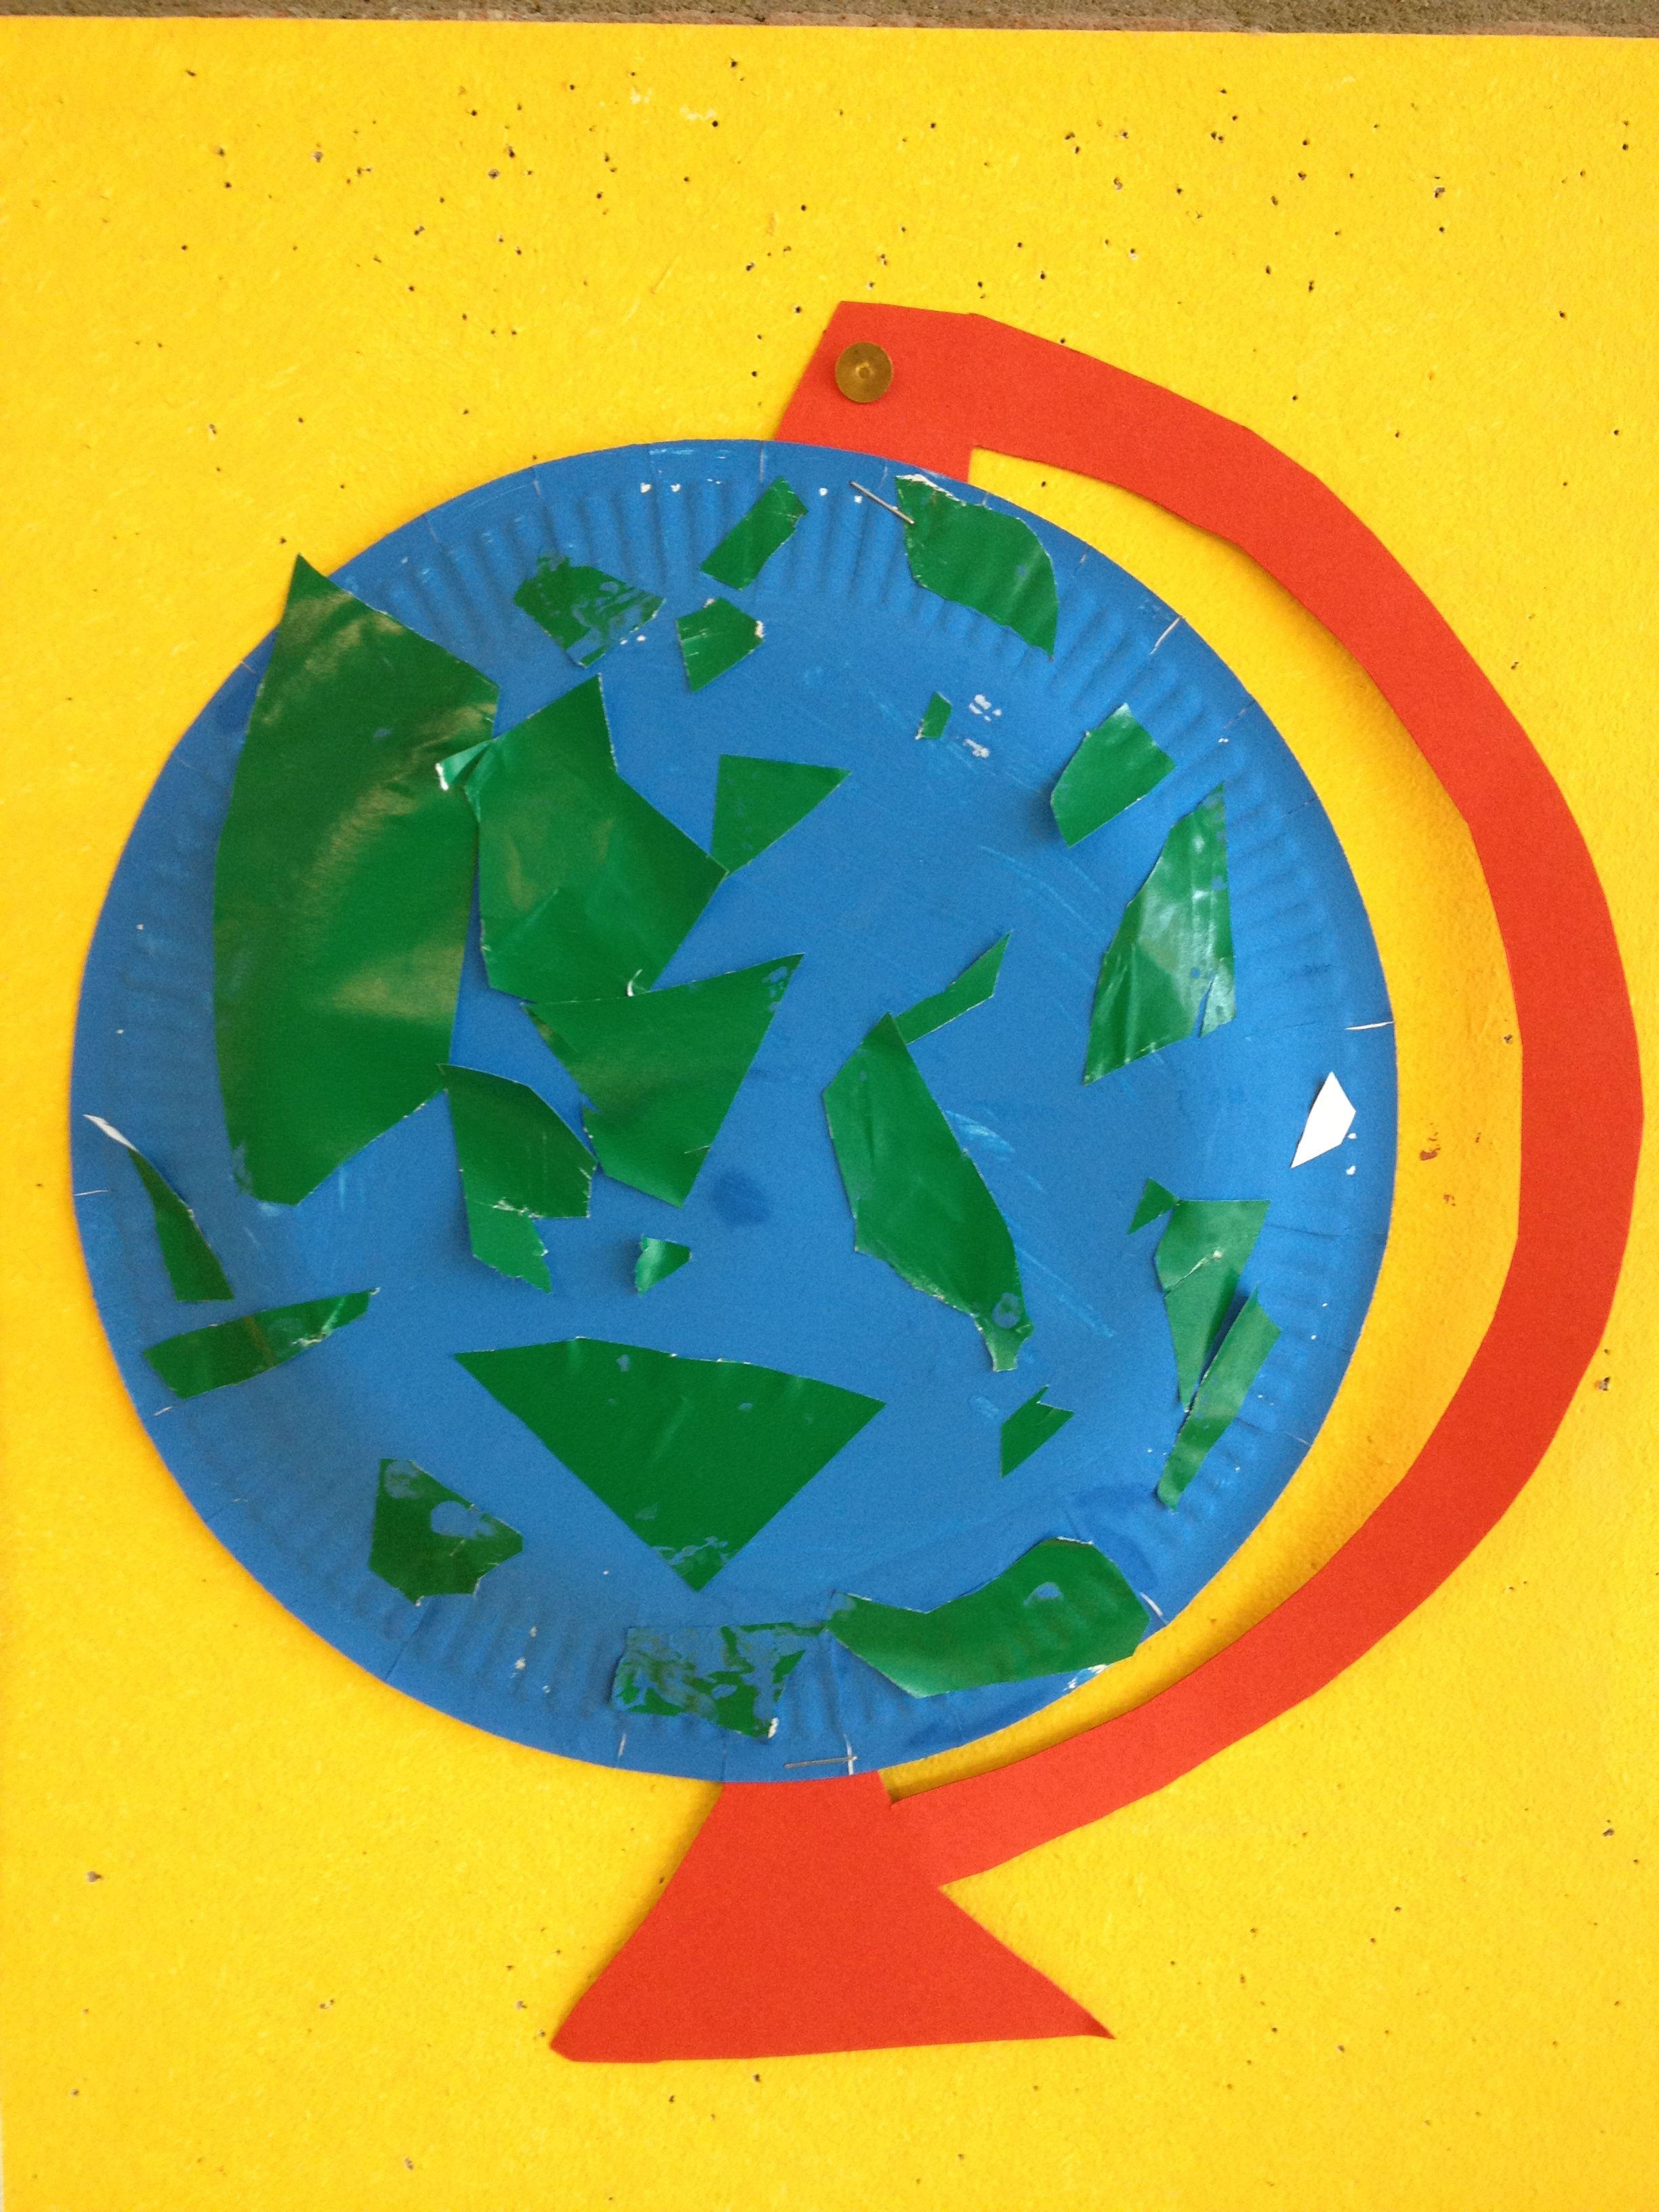 Pin Van Nadine Gehrke Op Kdv Thema Wereldbol Knutselen Rond De Wereld